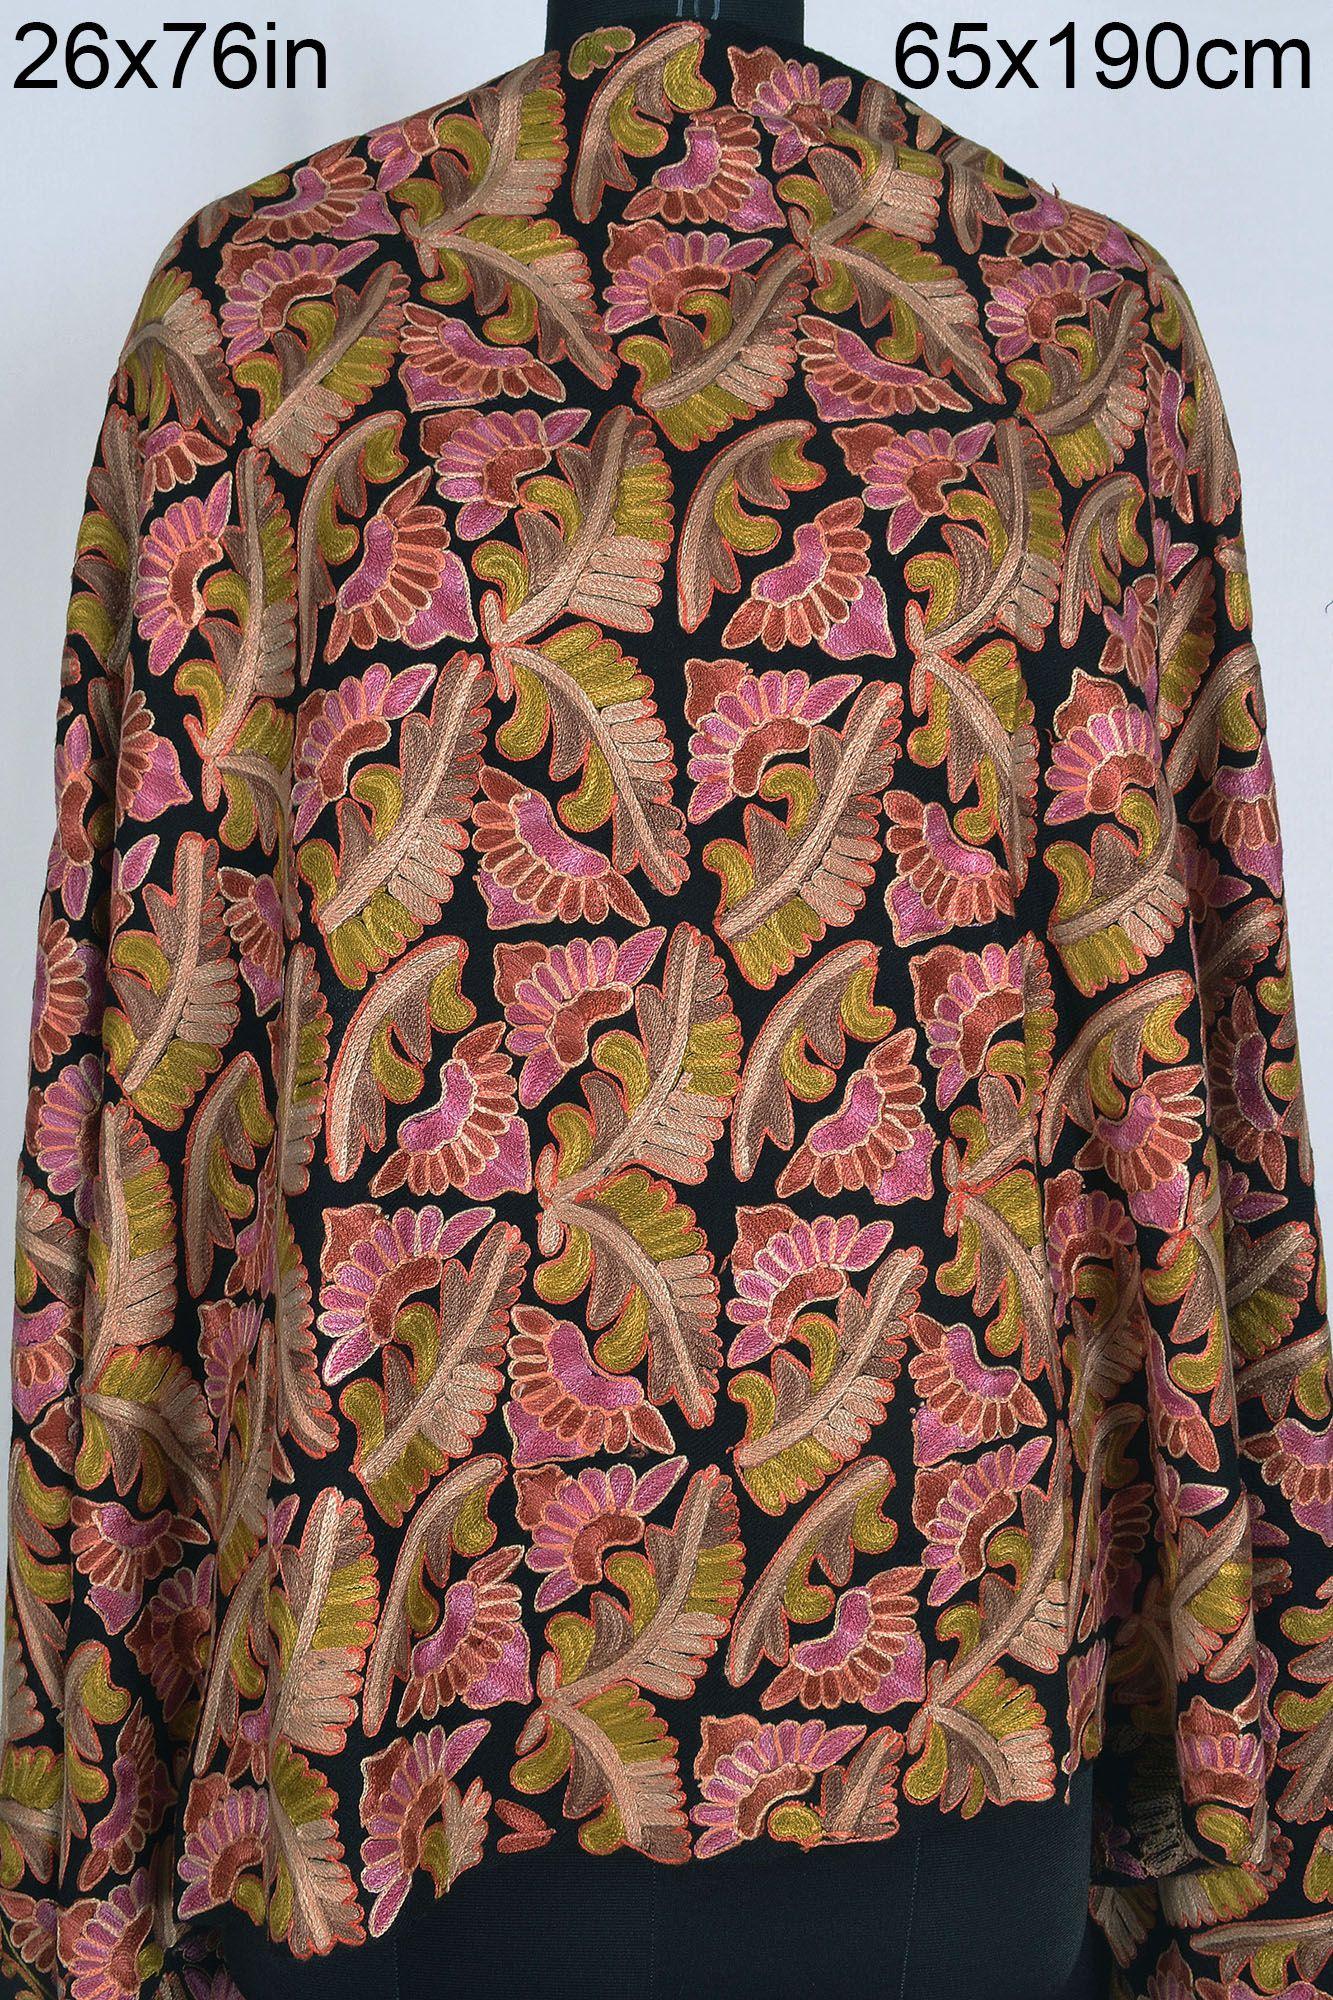 REAL KASHMIRI EMBROIDERED 100 CASHMERE SHAWL CREWEL  : kashmiri embroidered shawl 04b from www.ebay.com size 1690 x 2251 jpeg 1356kB